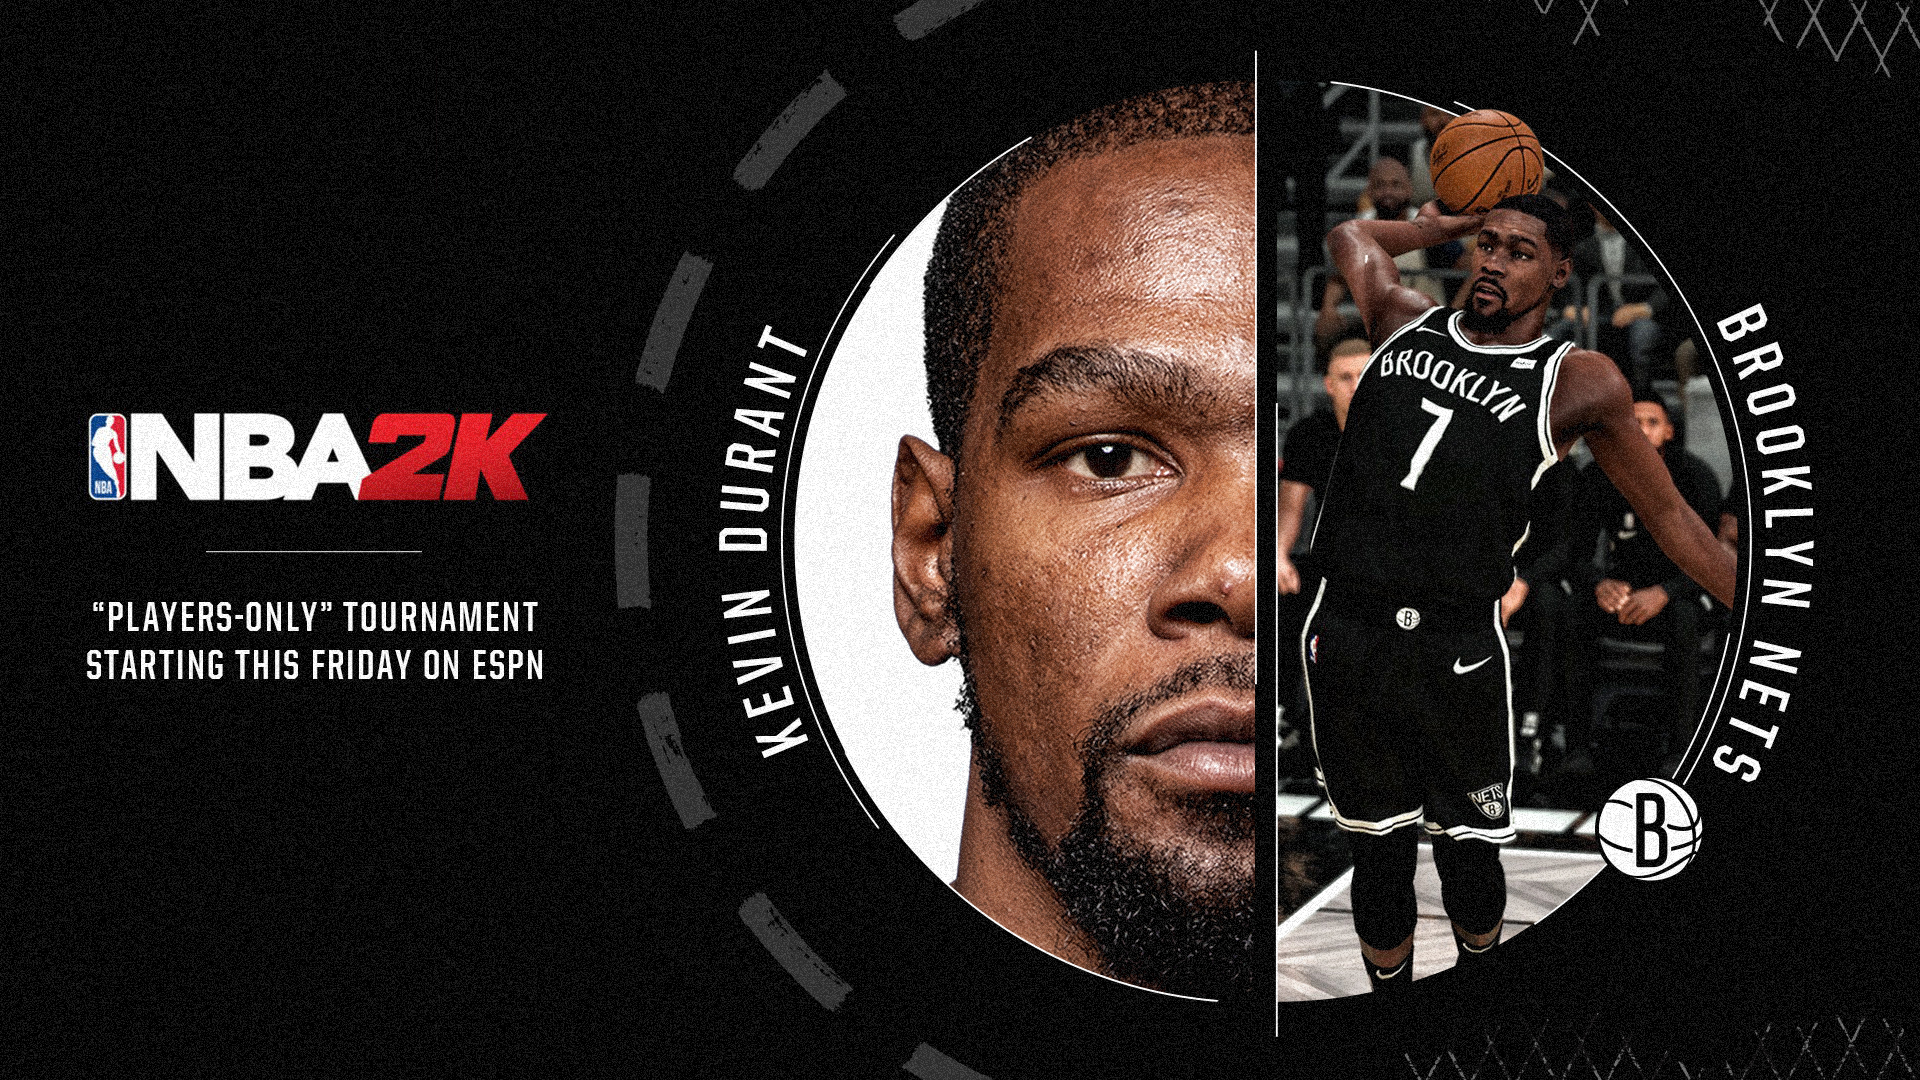 NBA2K球员锦标赛的赔率:杜兰特、特雷-杨、艾顿前三